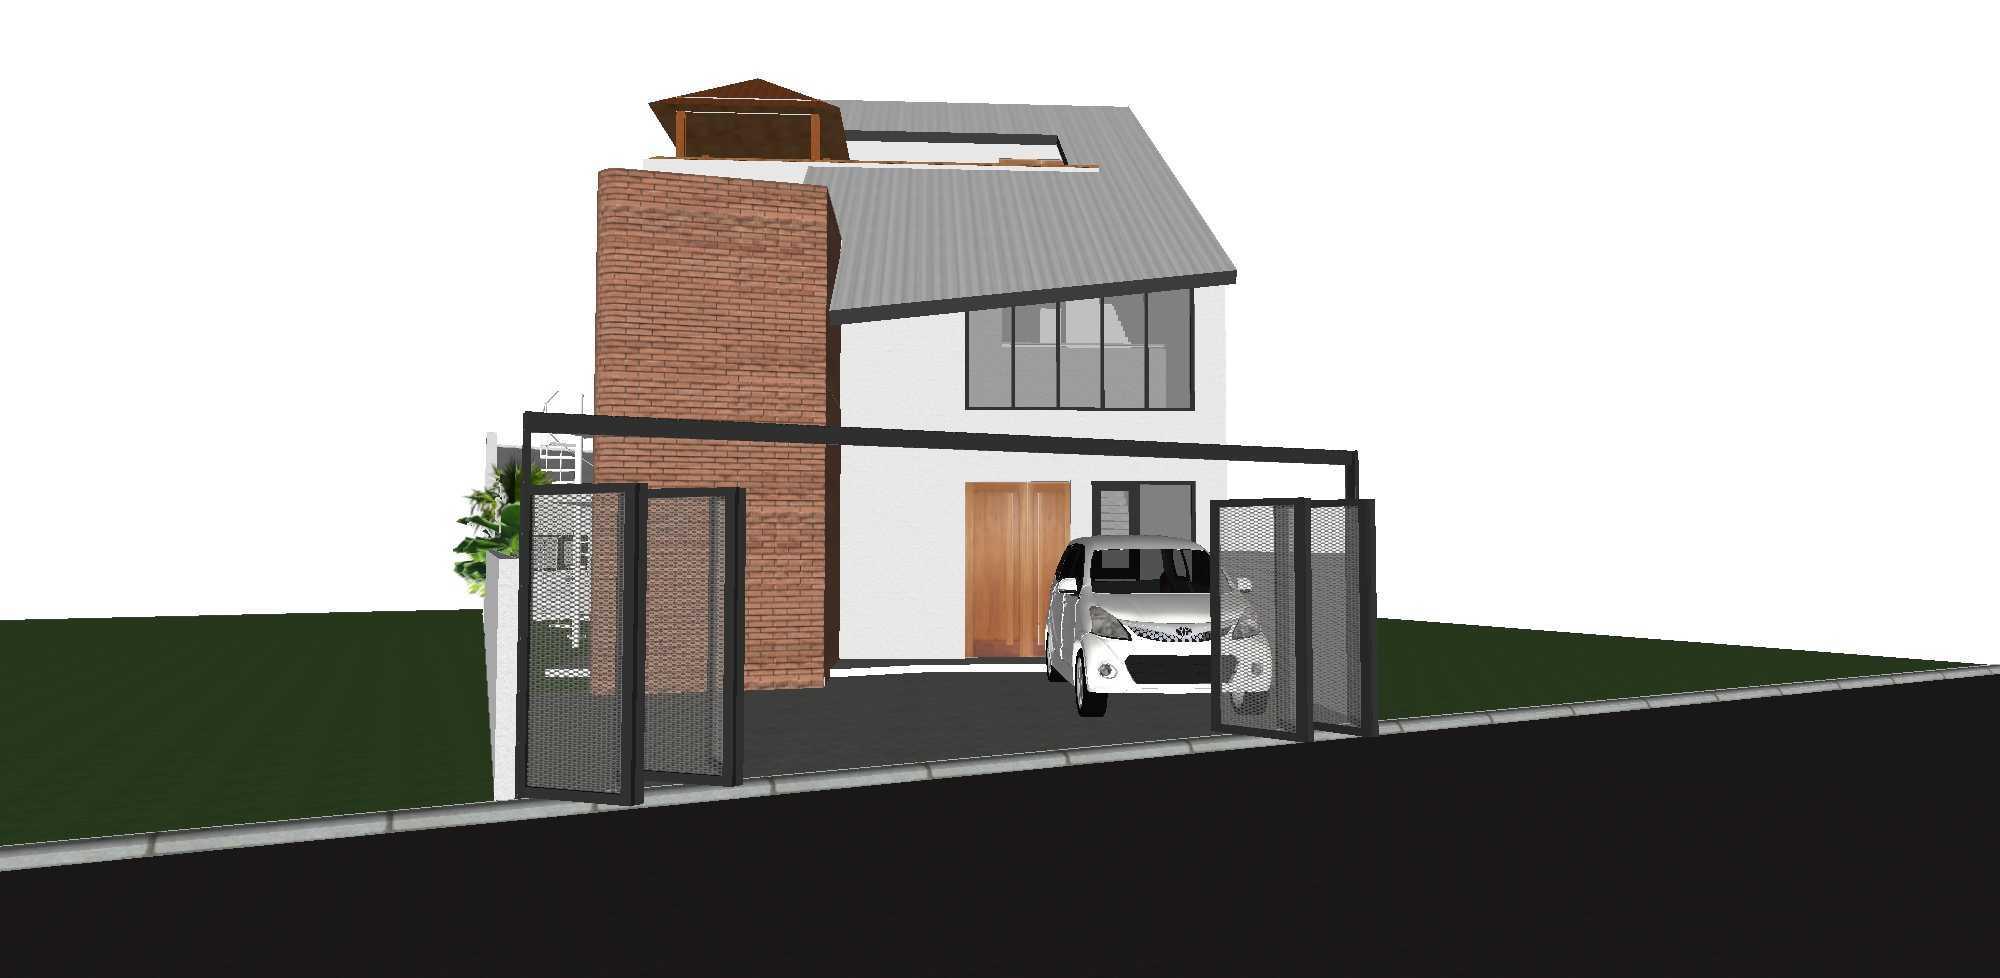 Zigzag Architecture Studio I House - Serpong Garden Cisauk, Tangerang, Banten, Indonesia Cisauk, Tangerang, Banten, Indonesia Zigzag-Architecture-Studio-I-House-Serpong-Garden   56165